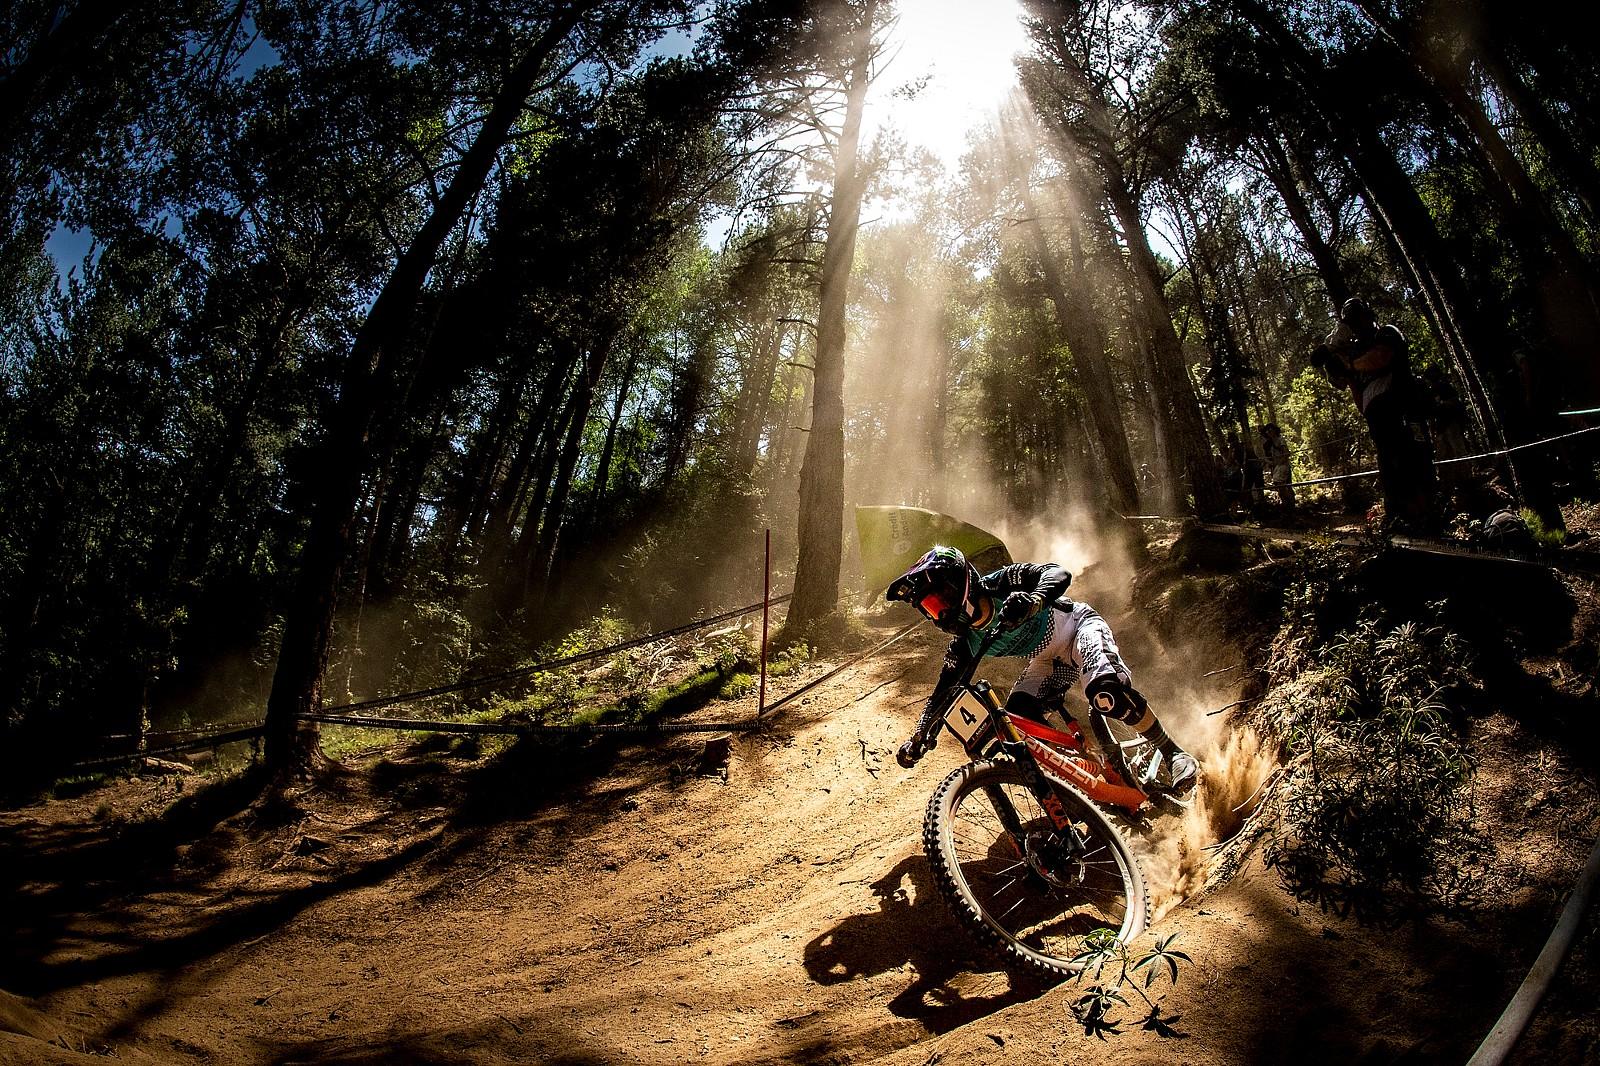 Danny Hart, Andorra World Cup DH - Danny Hart 2019 World Cup Downhill Photos - Mountain Biking Pictures - Vital MTB